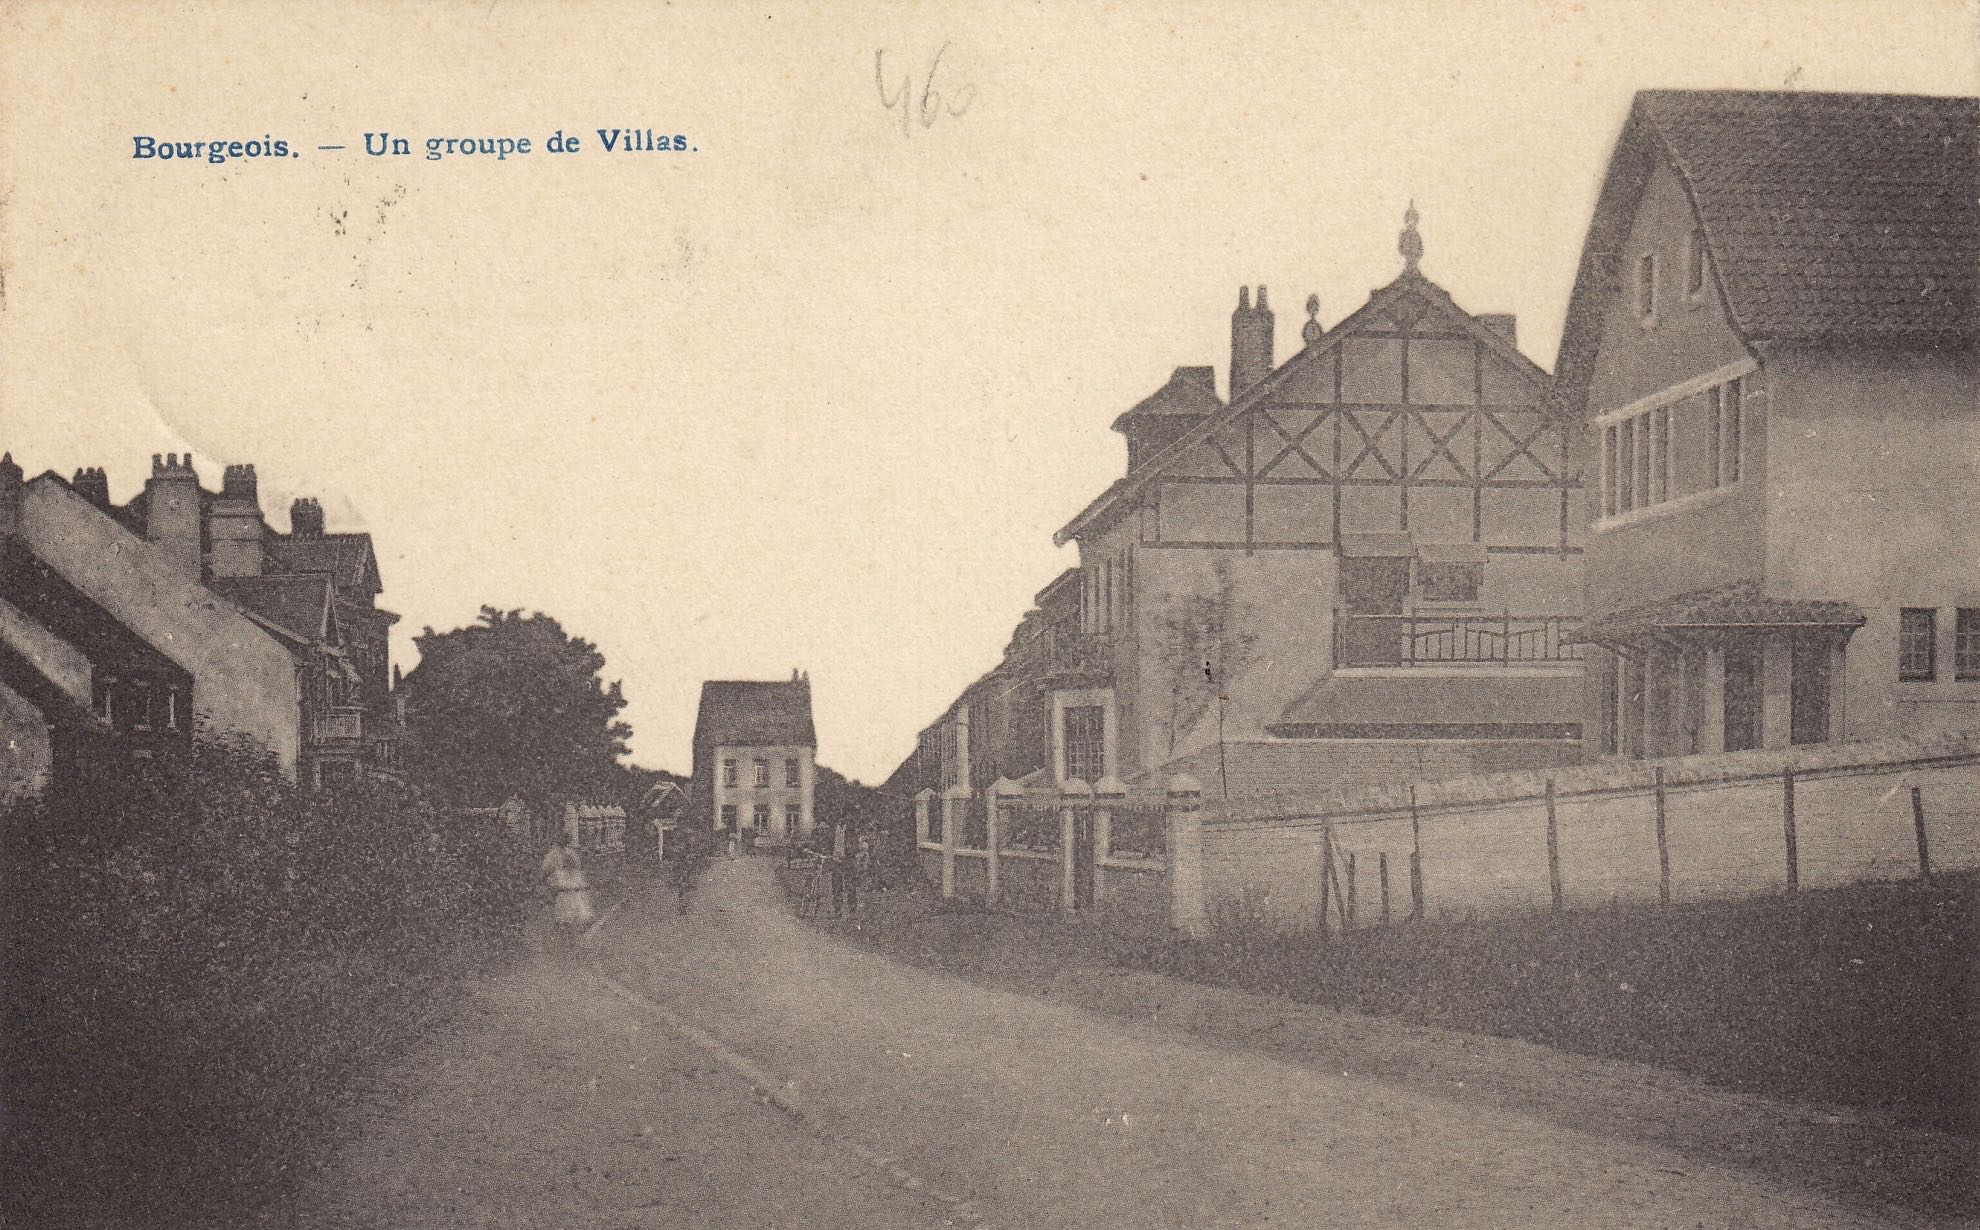 1919 Un groupe de villas Bourgeois rue Haute coll. Jean-Louis Lebrun